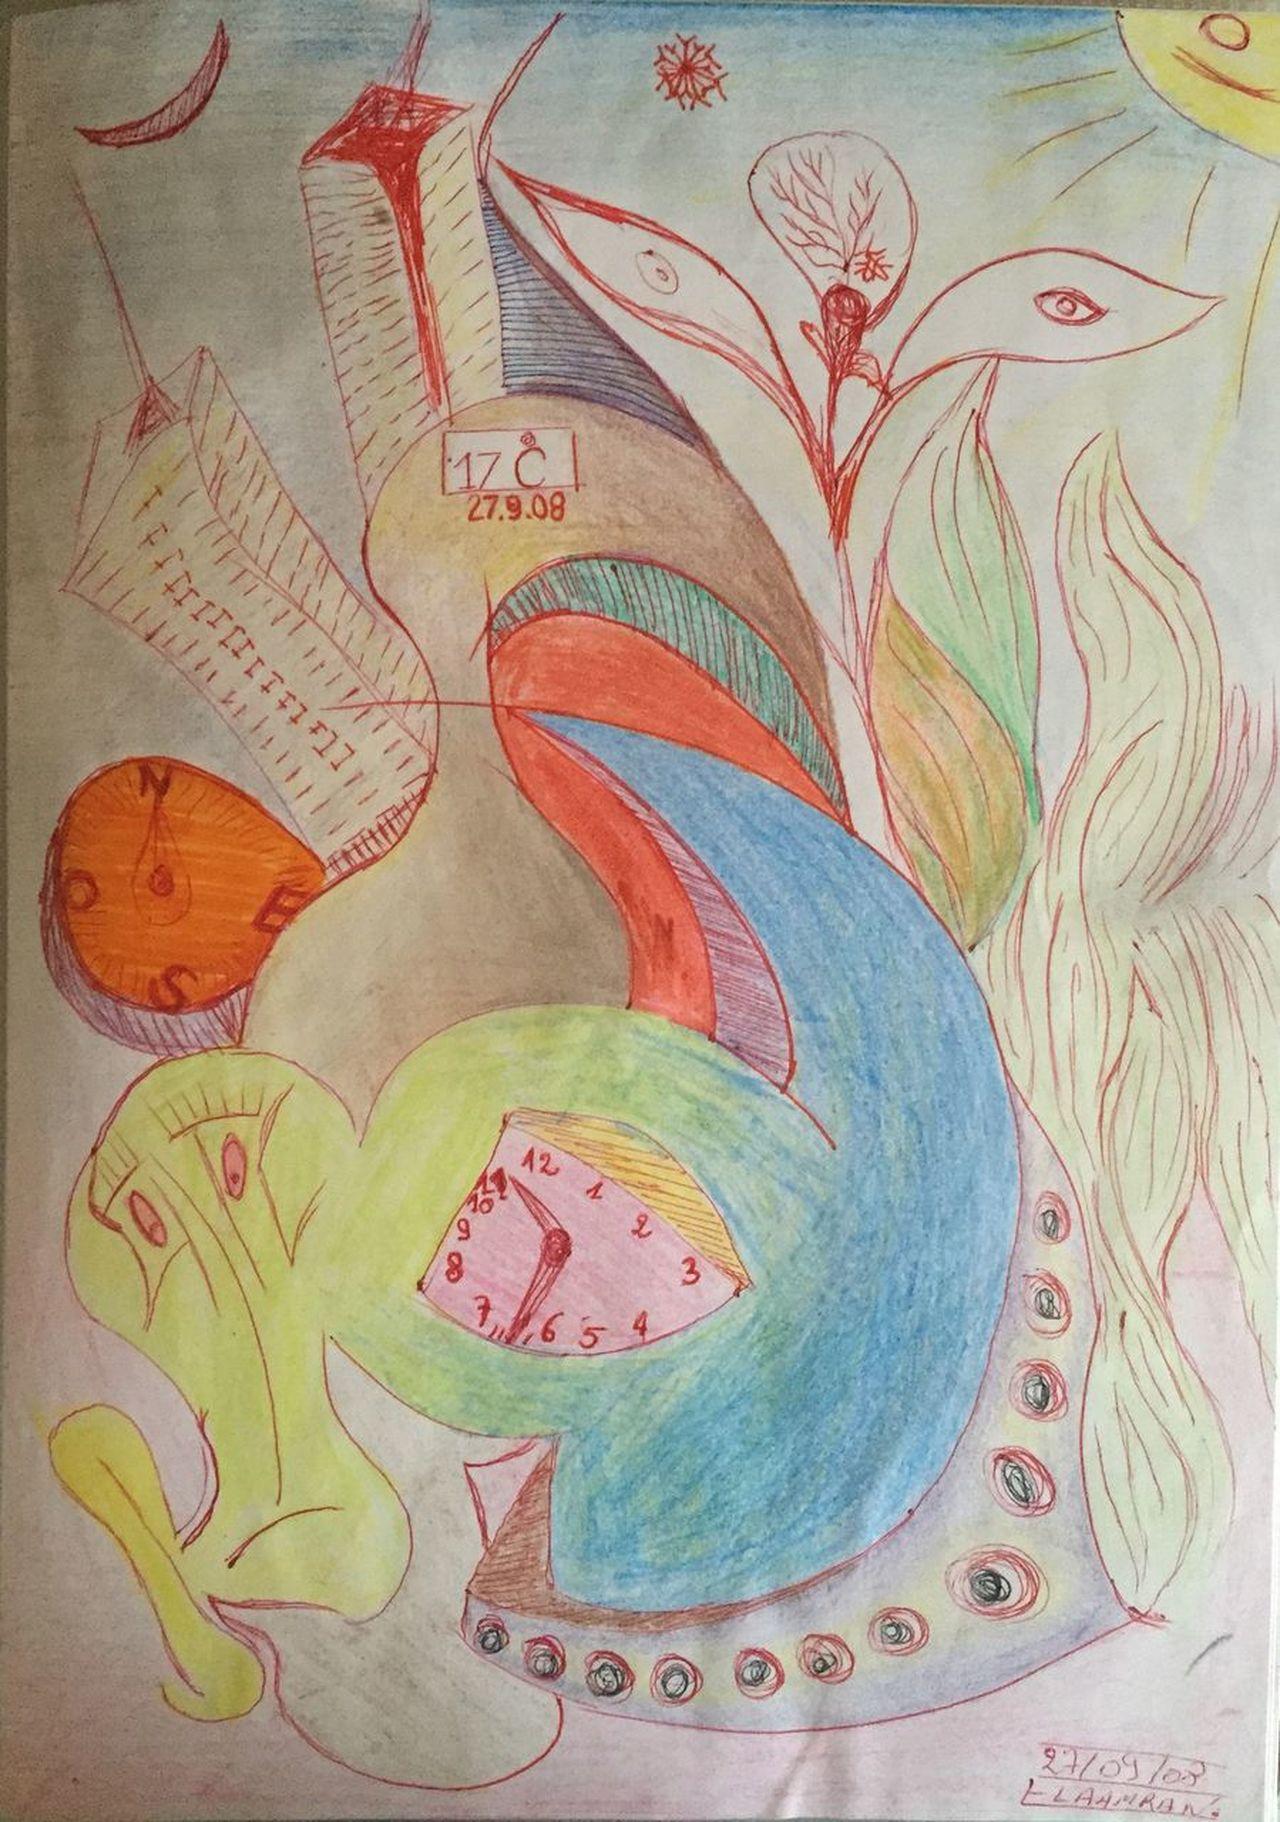 Art, Drawing, Creativity Designing Dessin M.EL AAMRANI Imassine